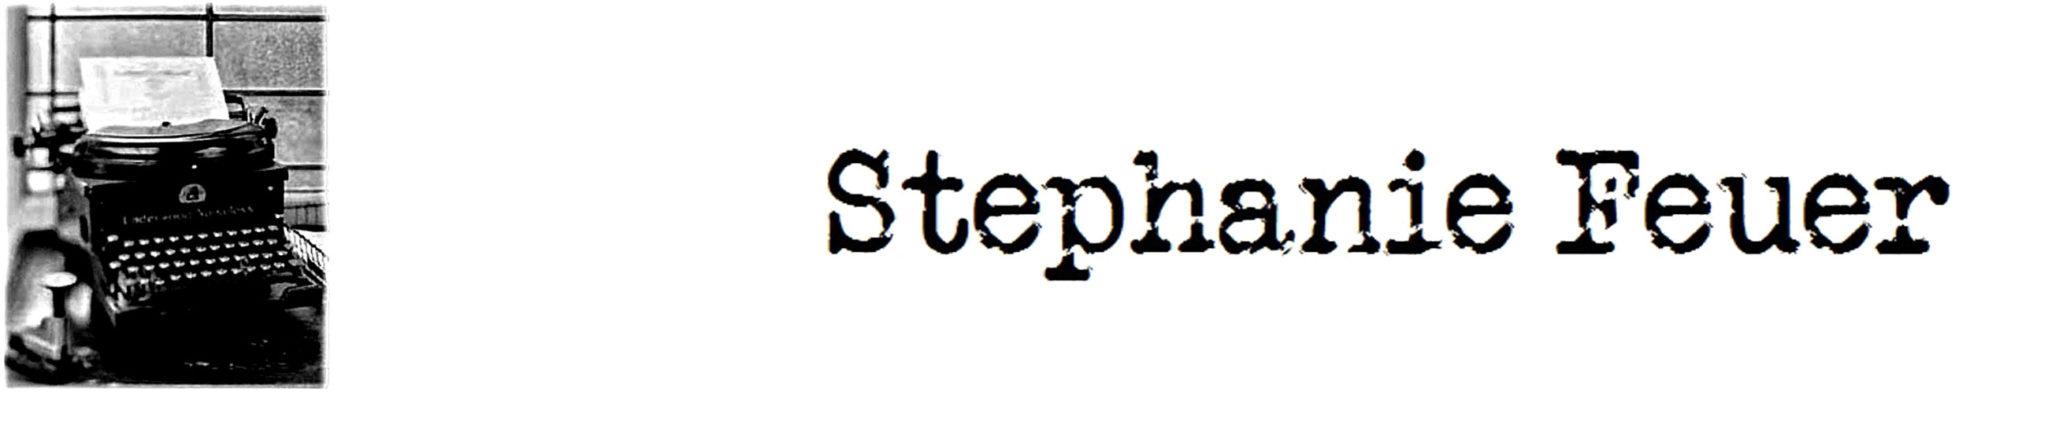 Stephanie Feuer